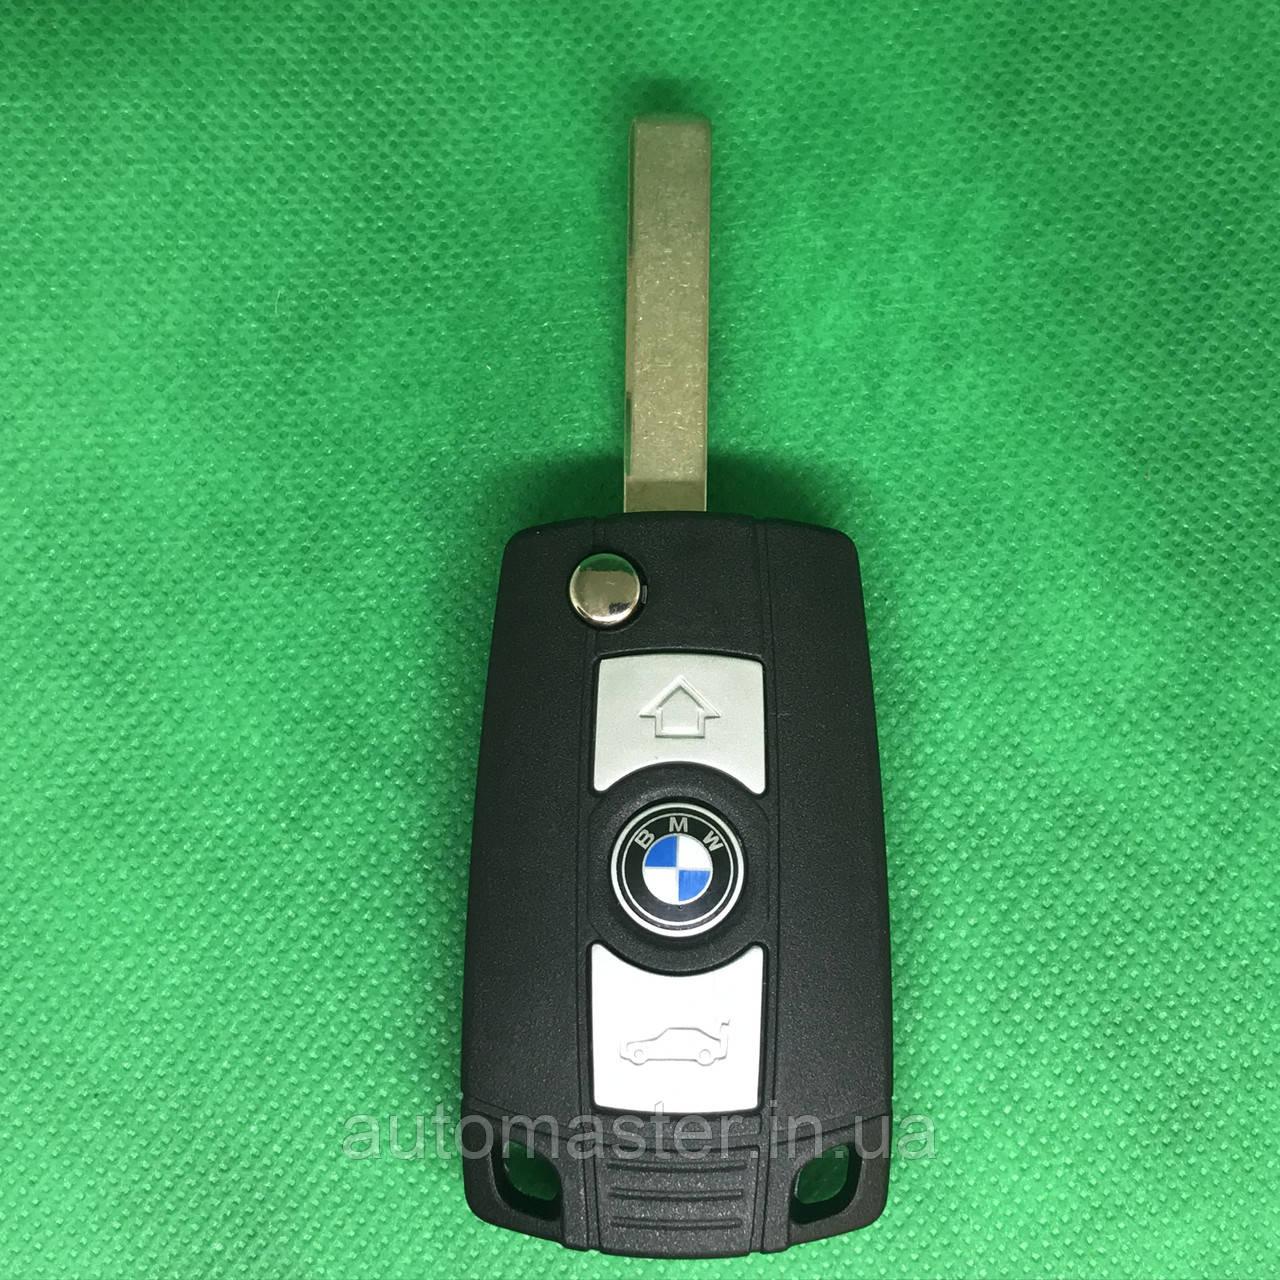 Корпус  ключа для переделки в выкидной ключ для BMW Е46, Е56, Е60, Х3, Х5 (БМВ) 3 - кнопки, лезвие HU92